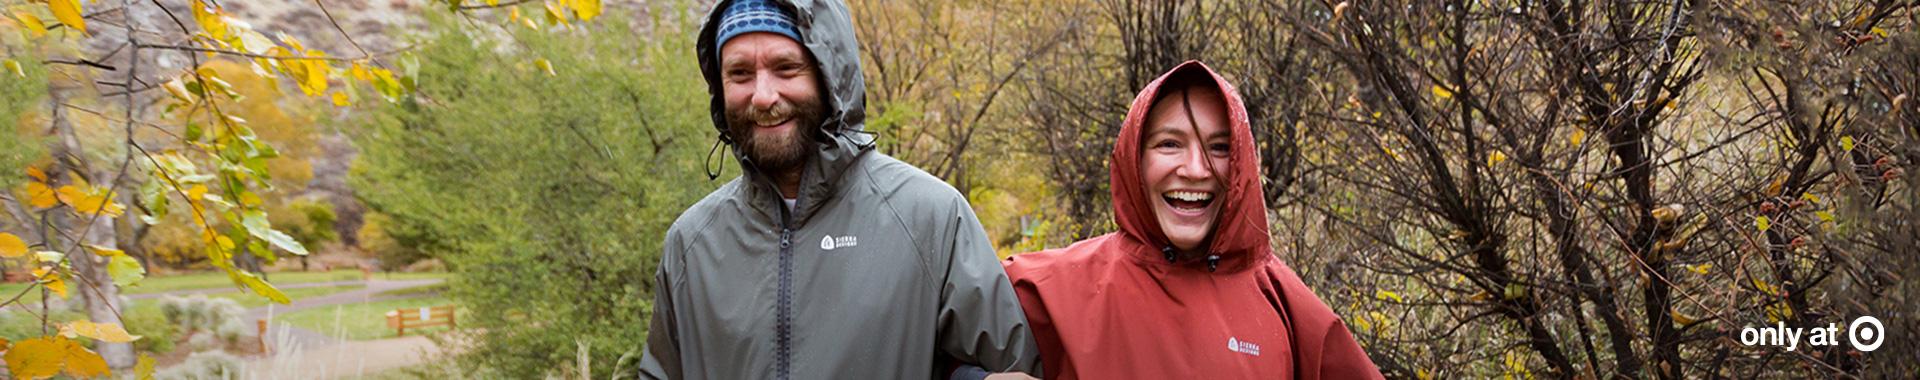 Couple hiking in the rain